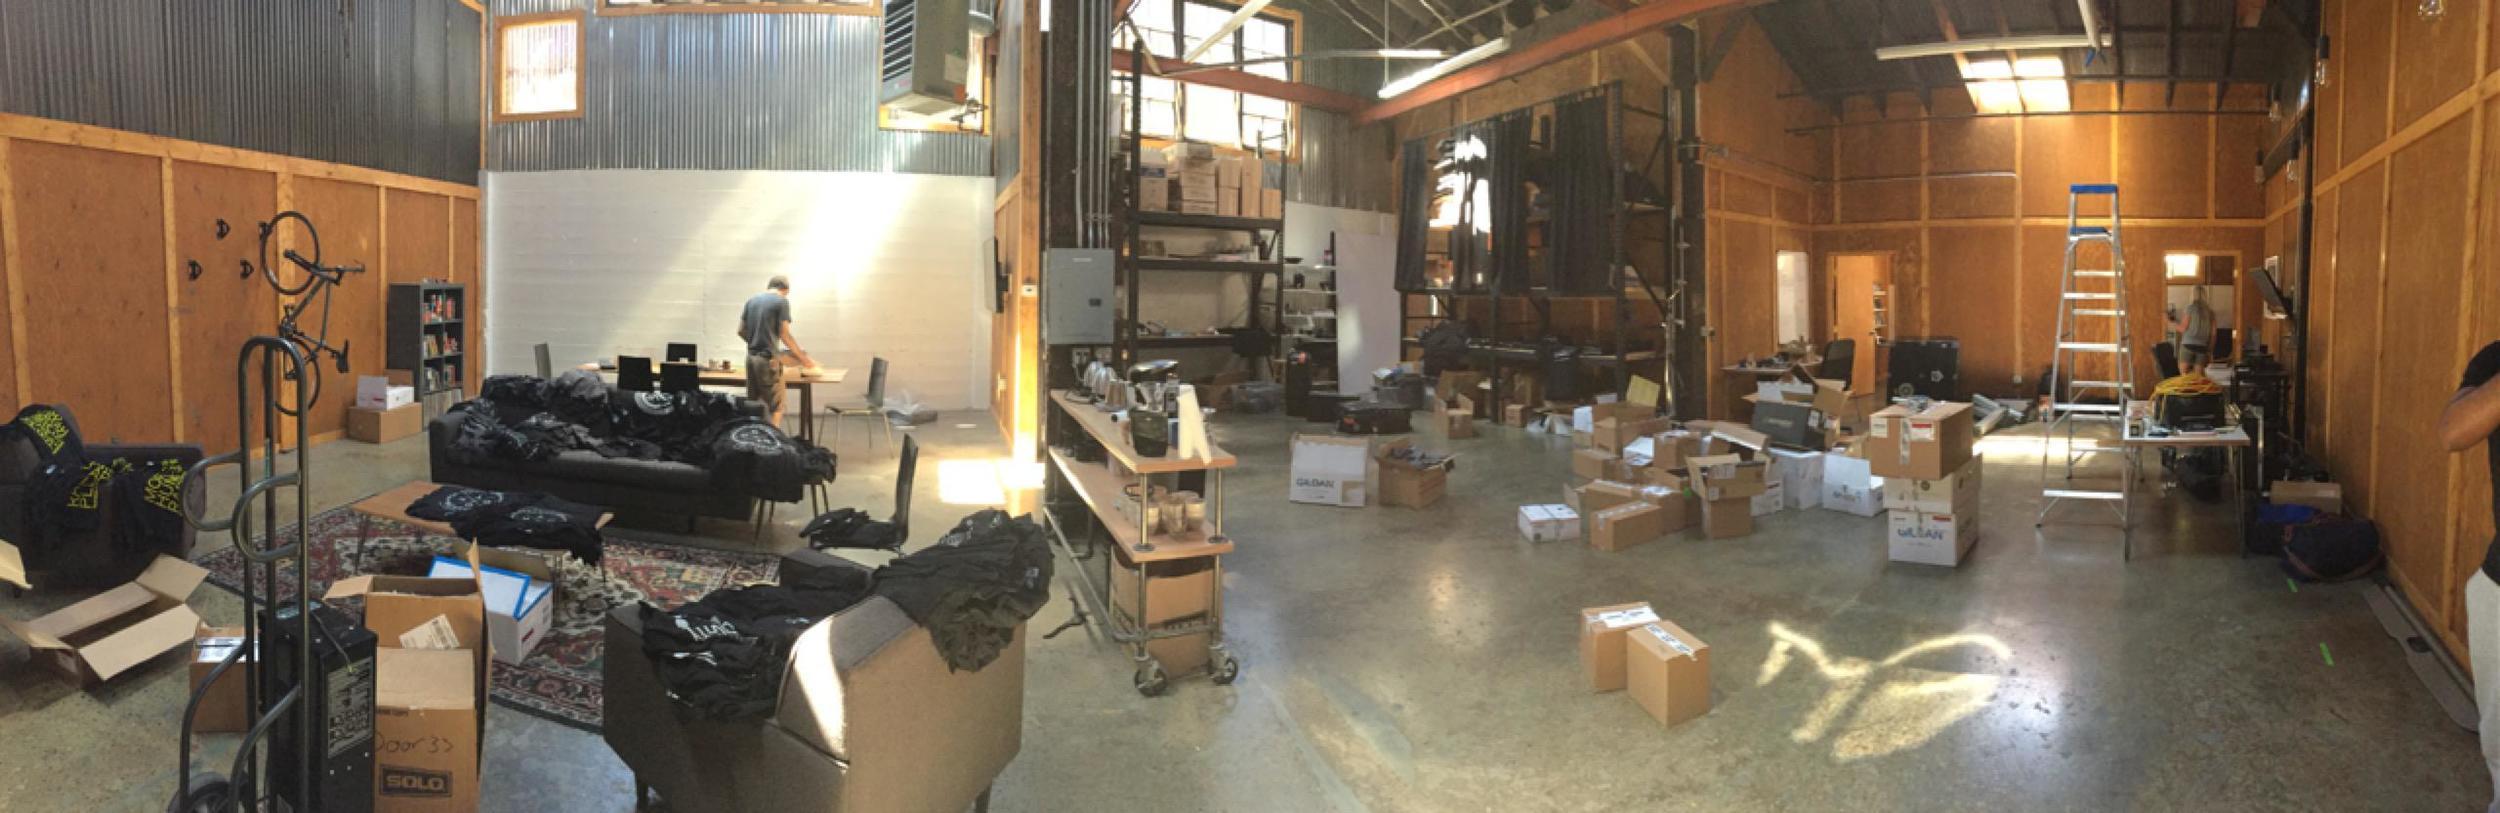 The Humble Beast Warehouse